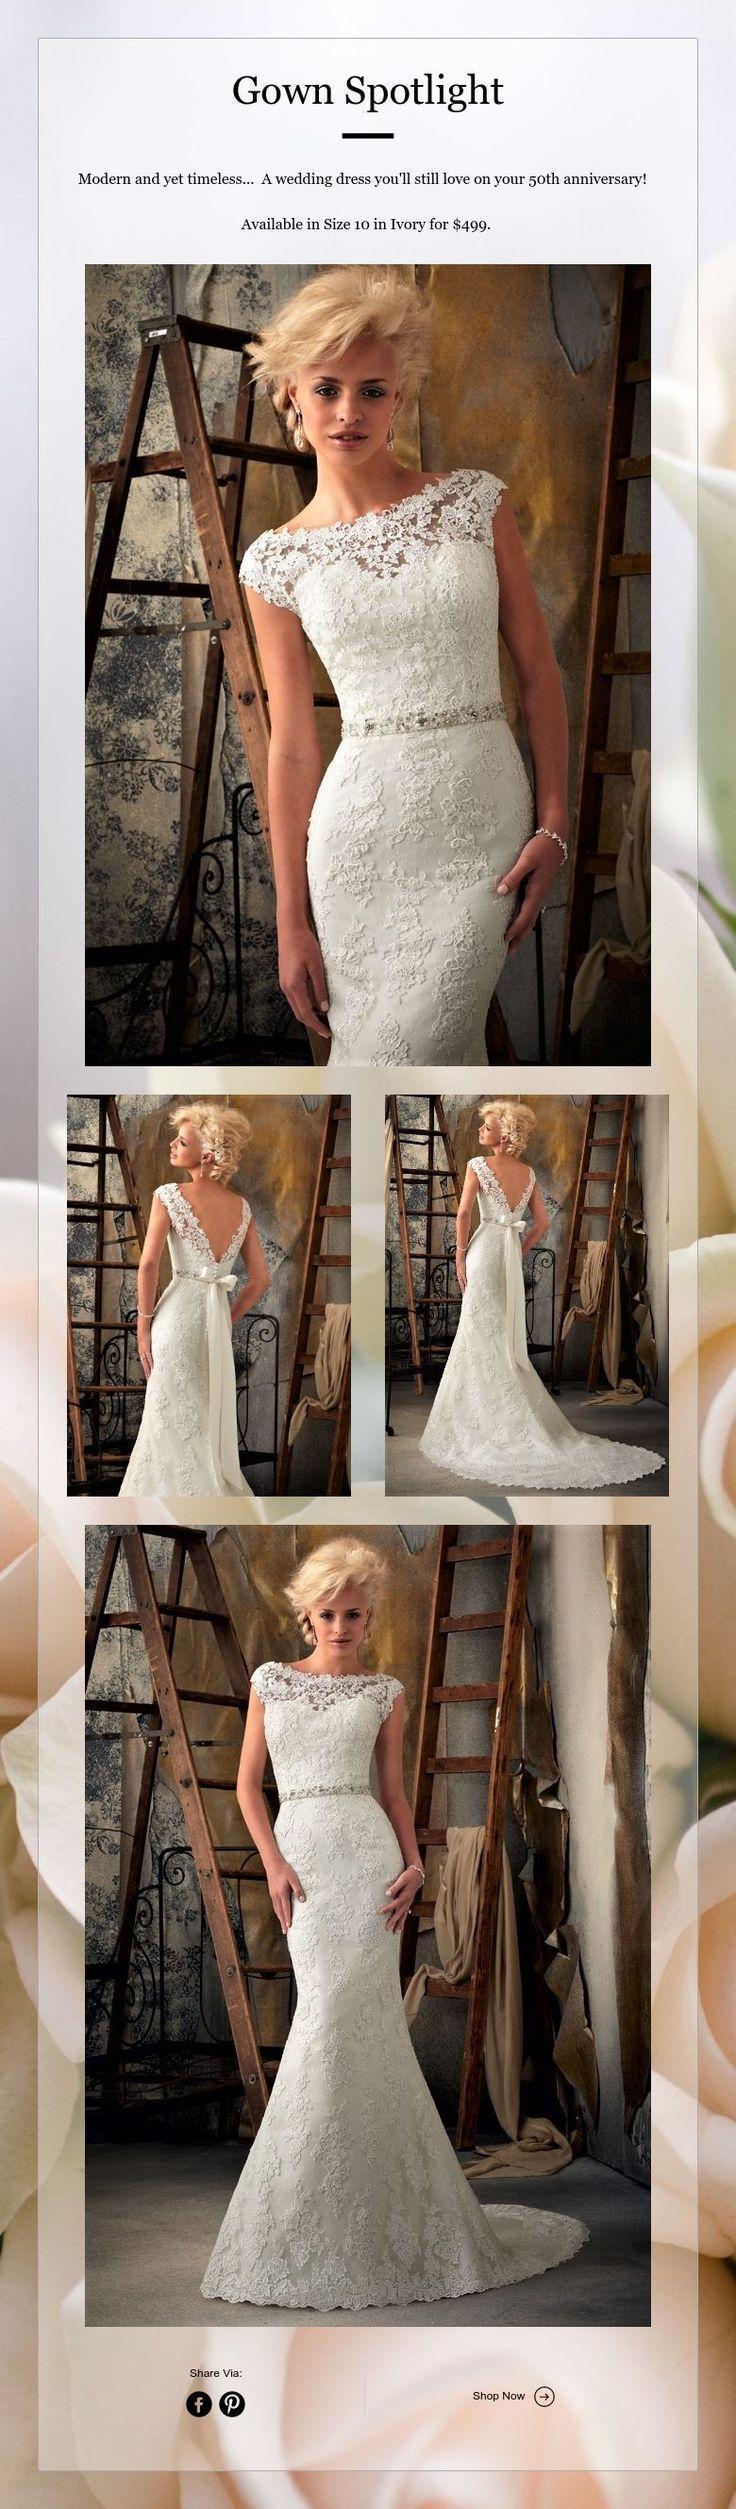 93 best Special Deals/Gown Spotlights images on Pinterest